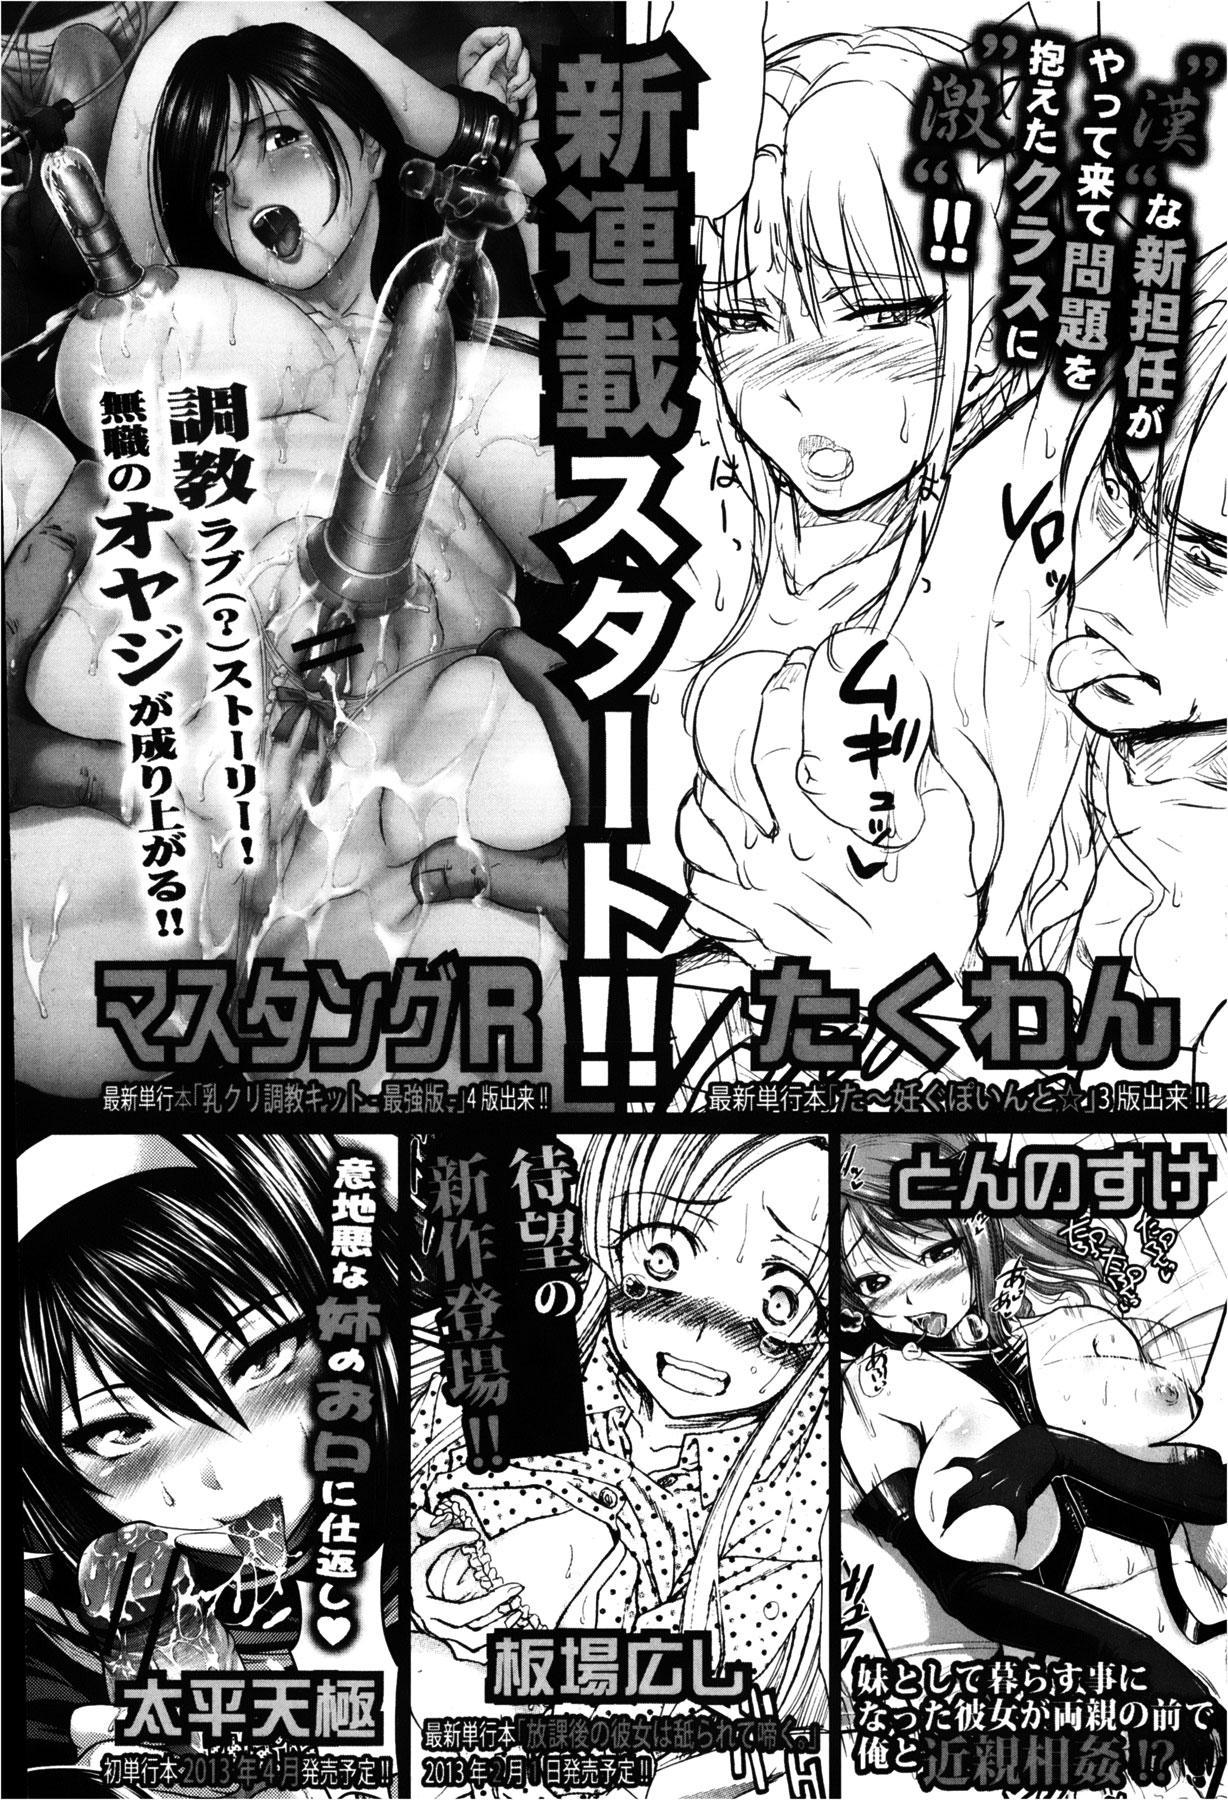 COMIC Shingeki 2013-02 375